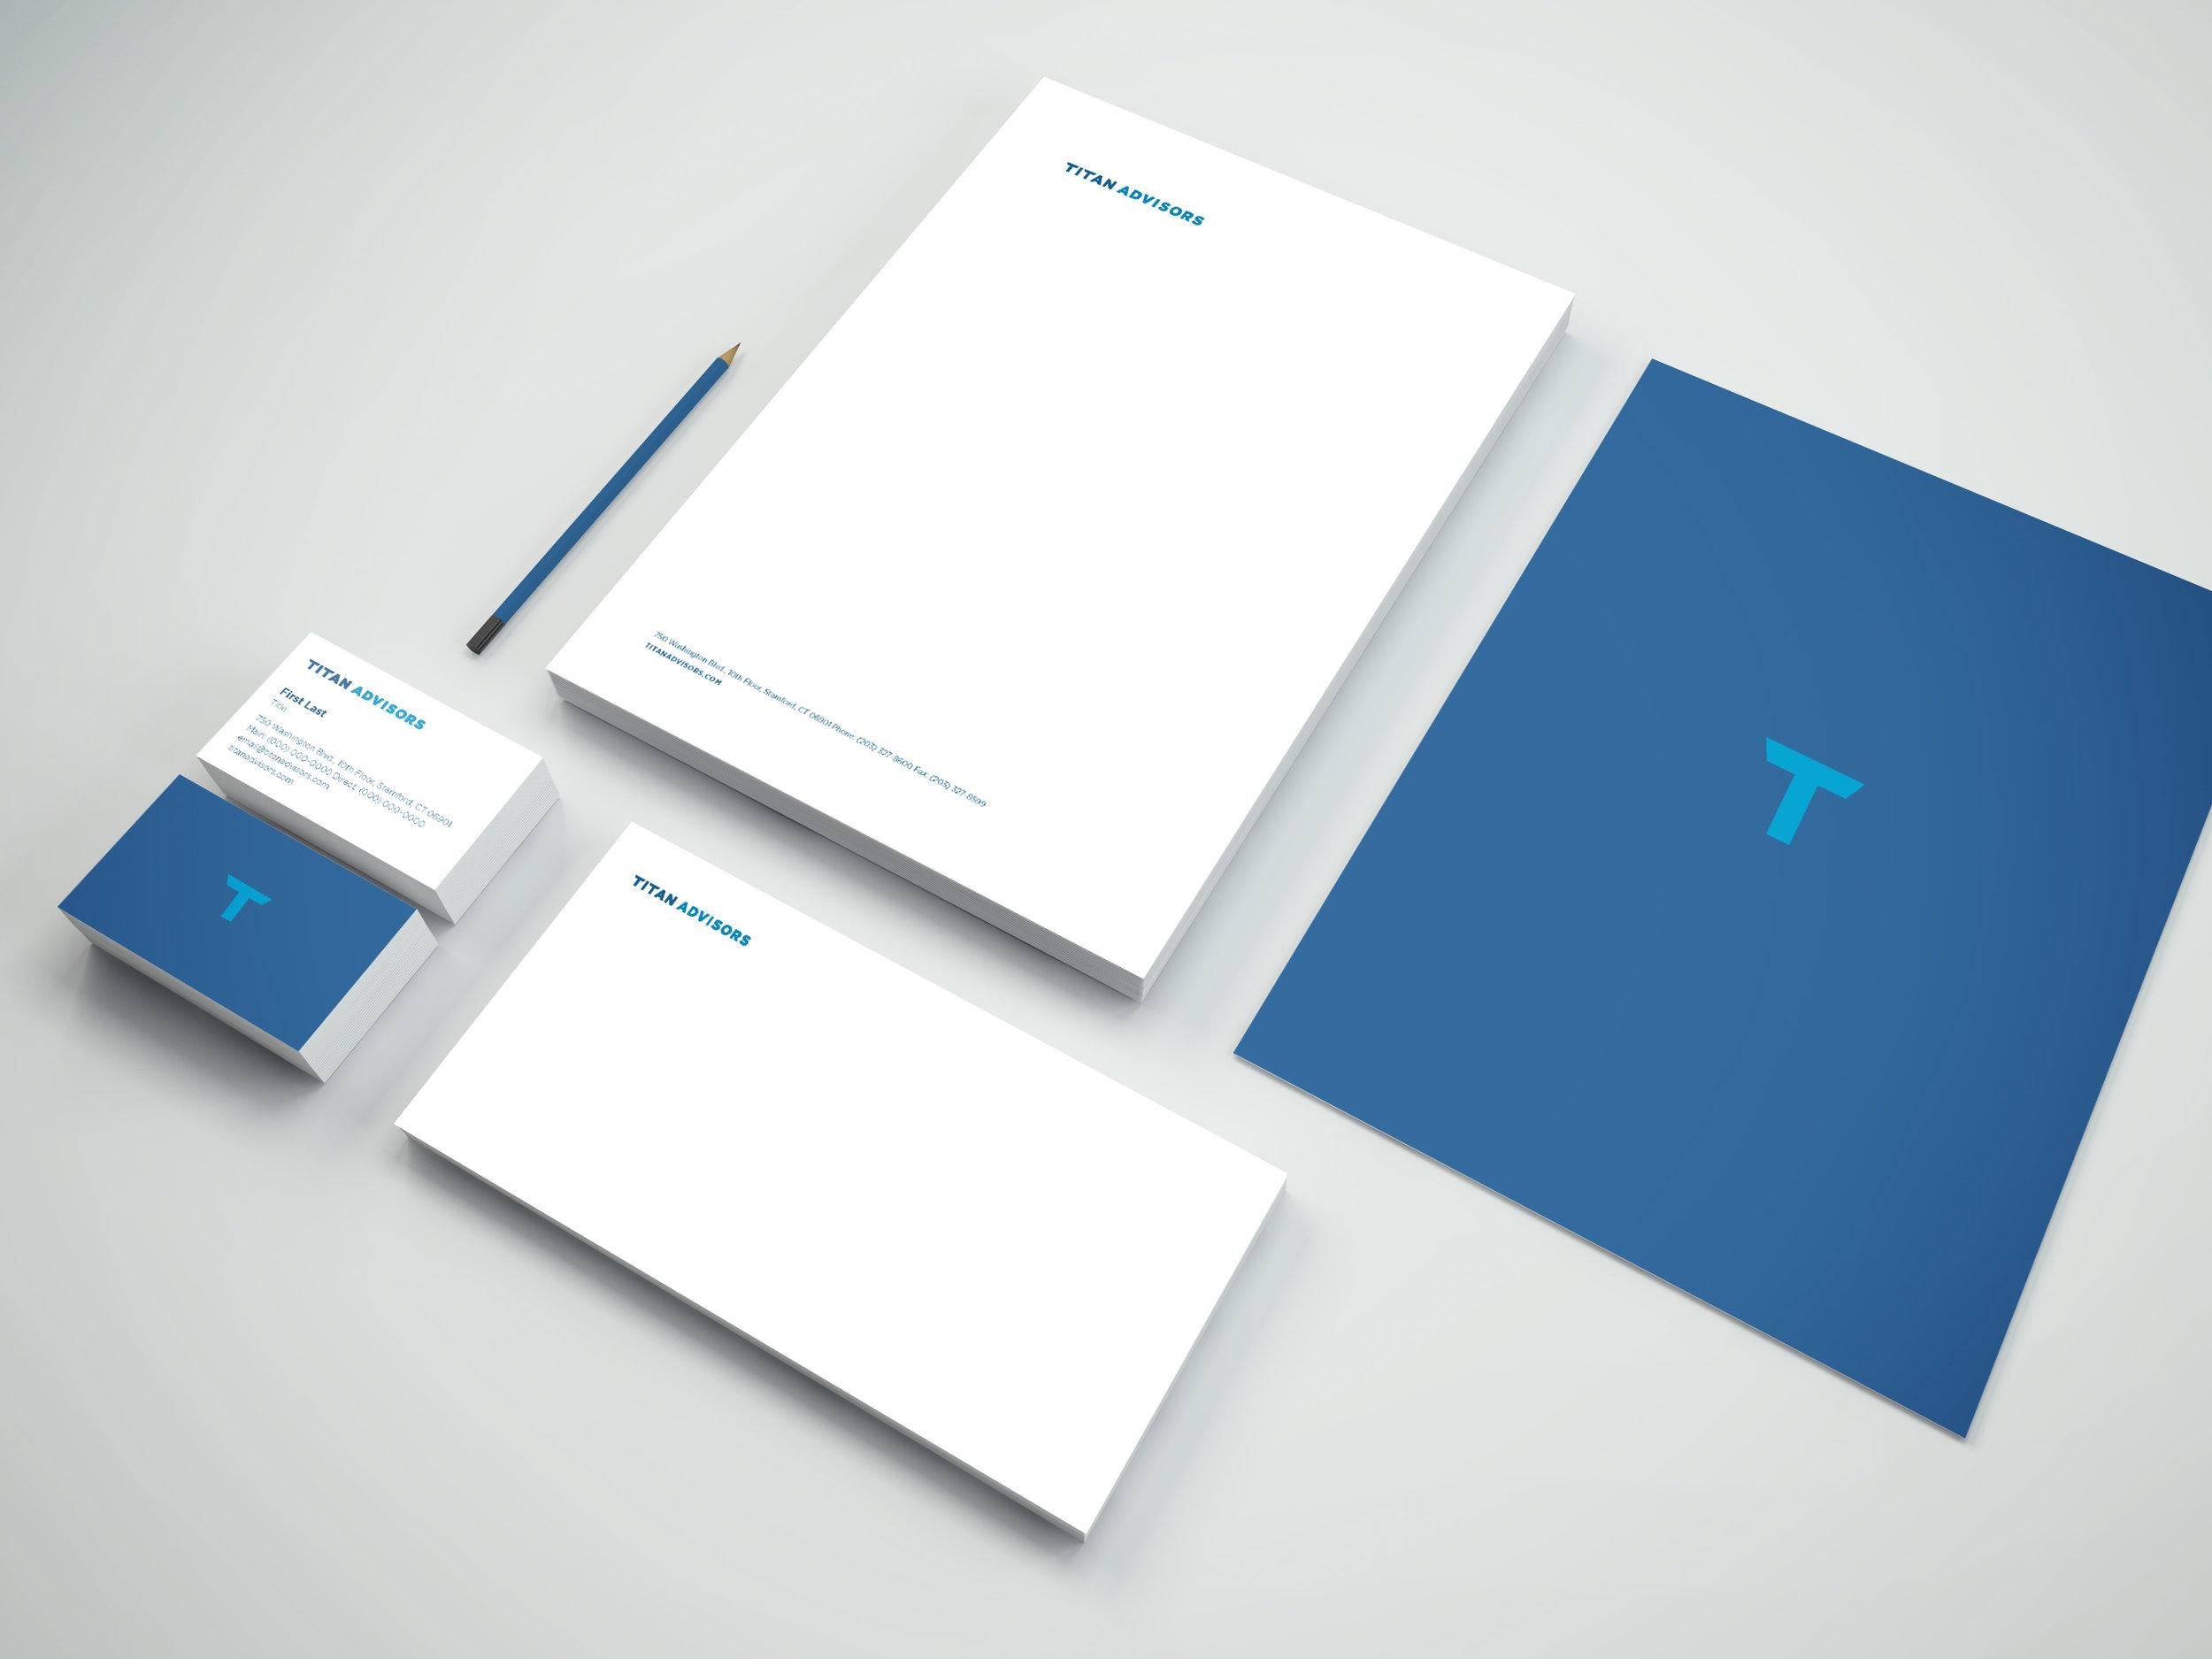 Titan_Branding-Stationery-Mockup.jpg